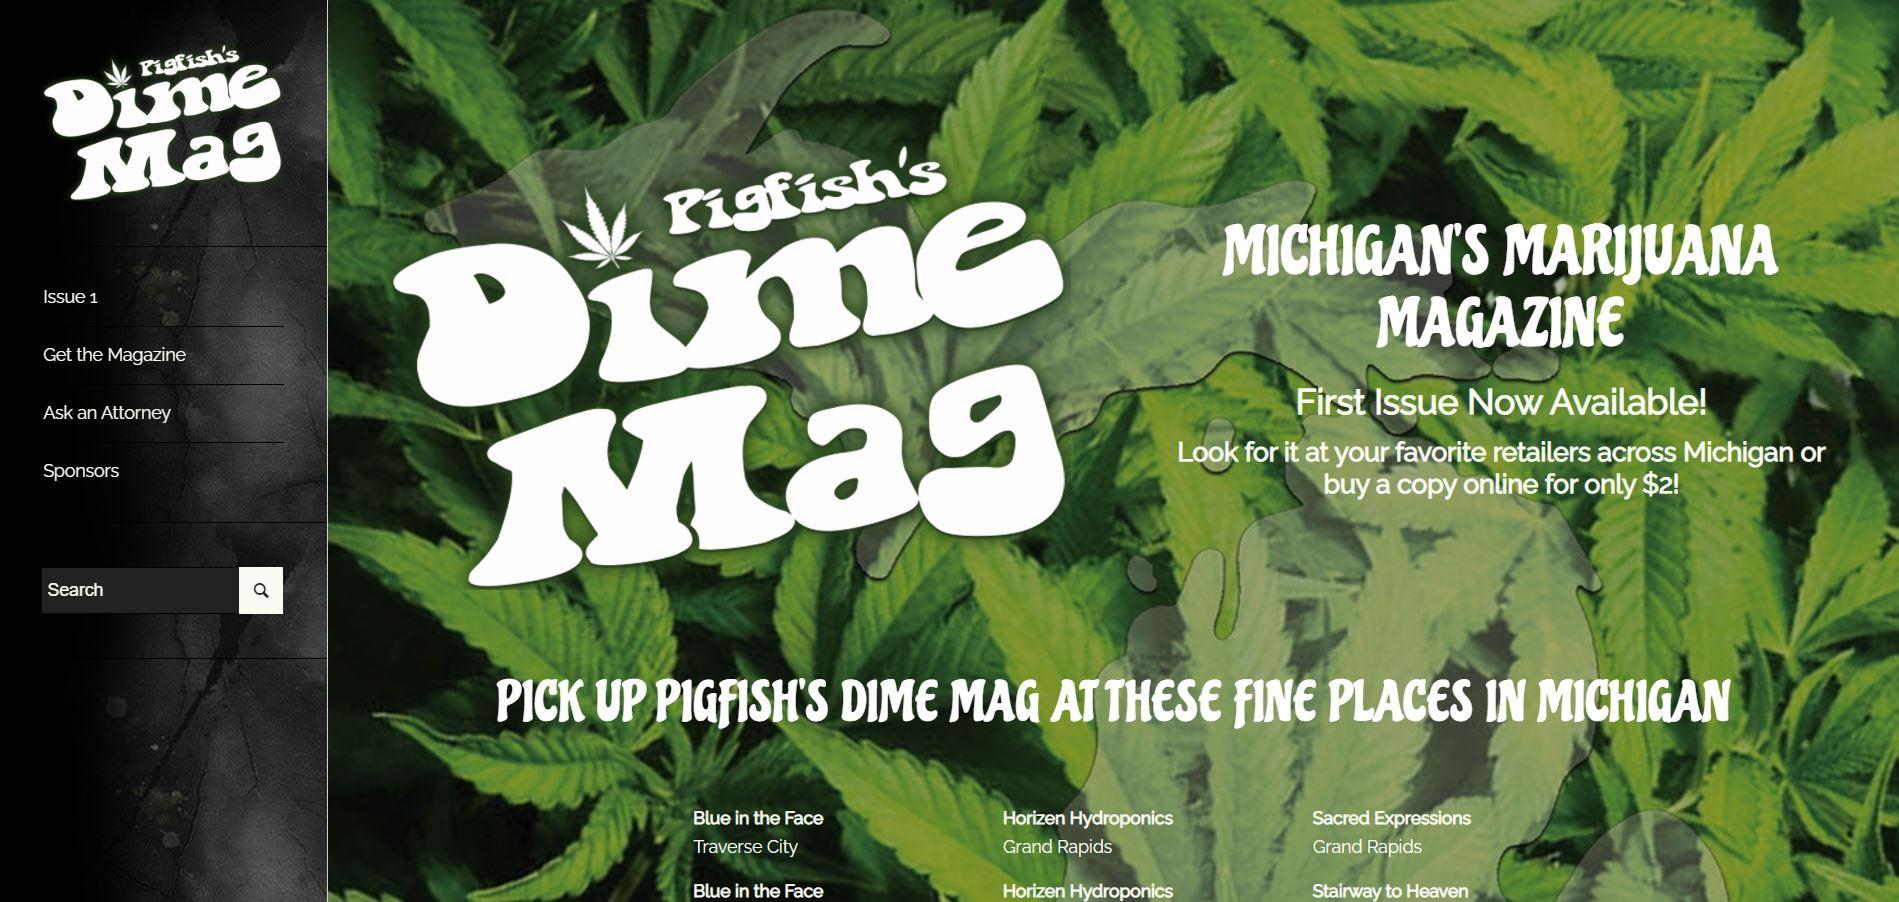 Pigfish's Dime Mag Website by Purple Gen - Purple-Gen.com